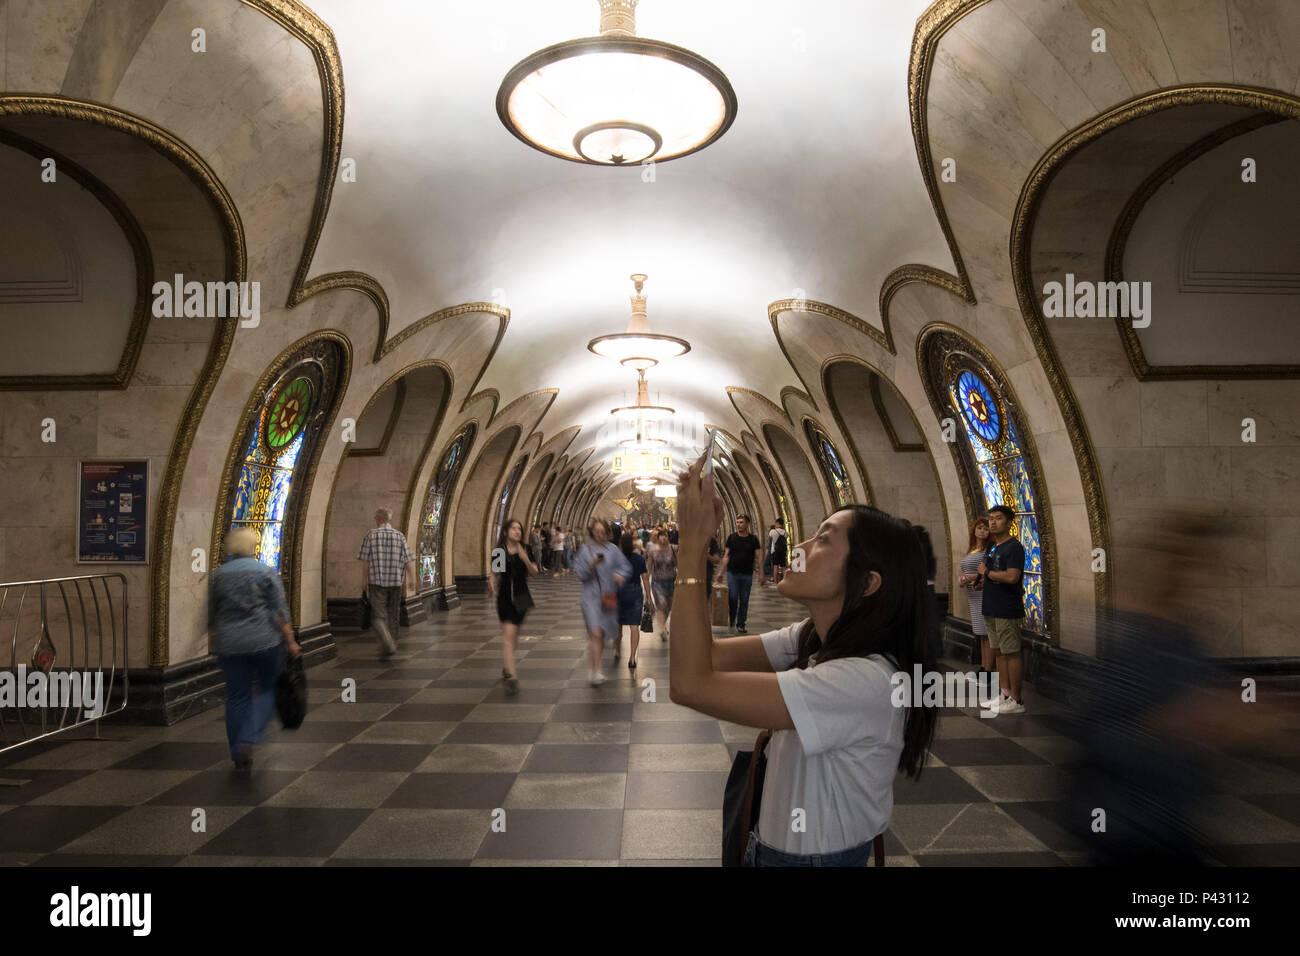 Moscow, Russia. 18th June, 2018. People walk around the Novoslobodskaya metro station. Credit: Federico Gambarini/dpa/Alamy Live News - Stock Image